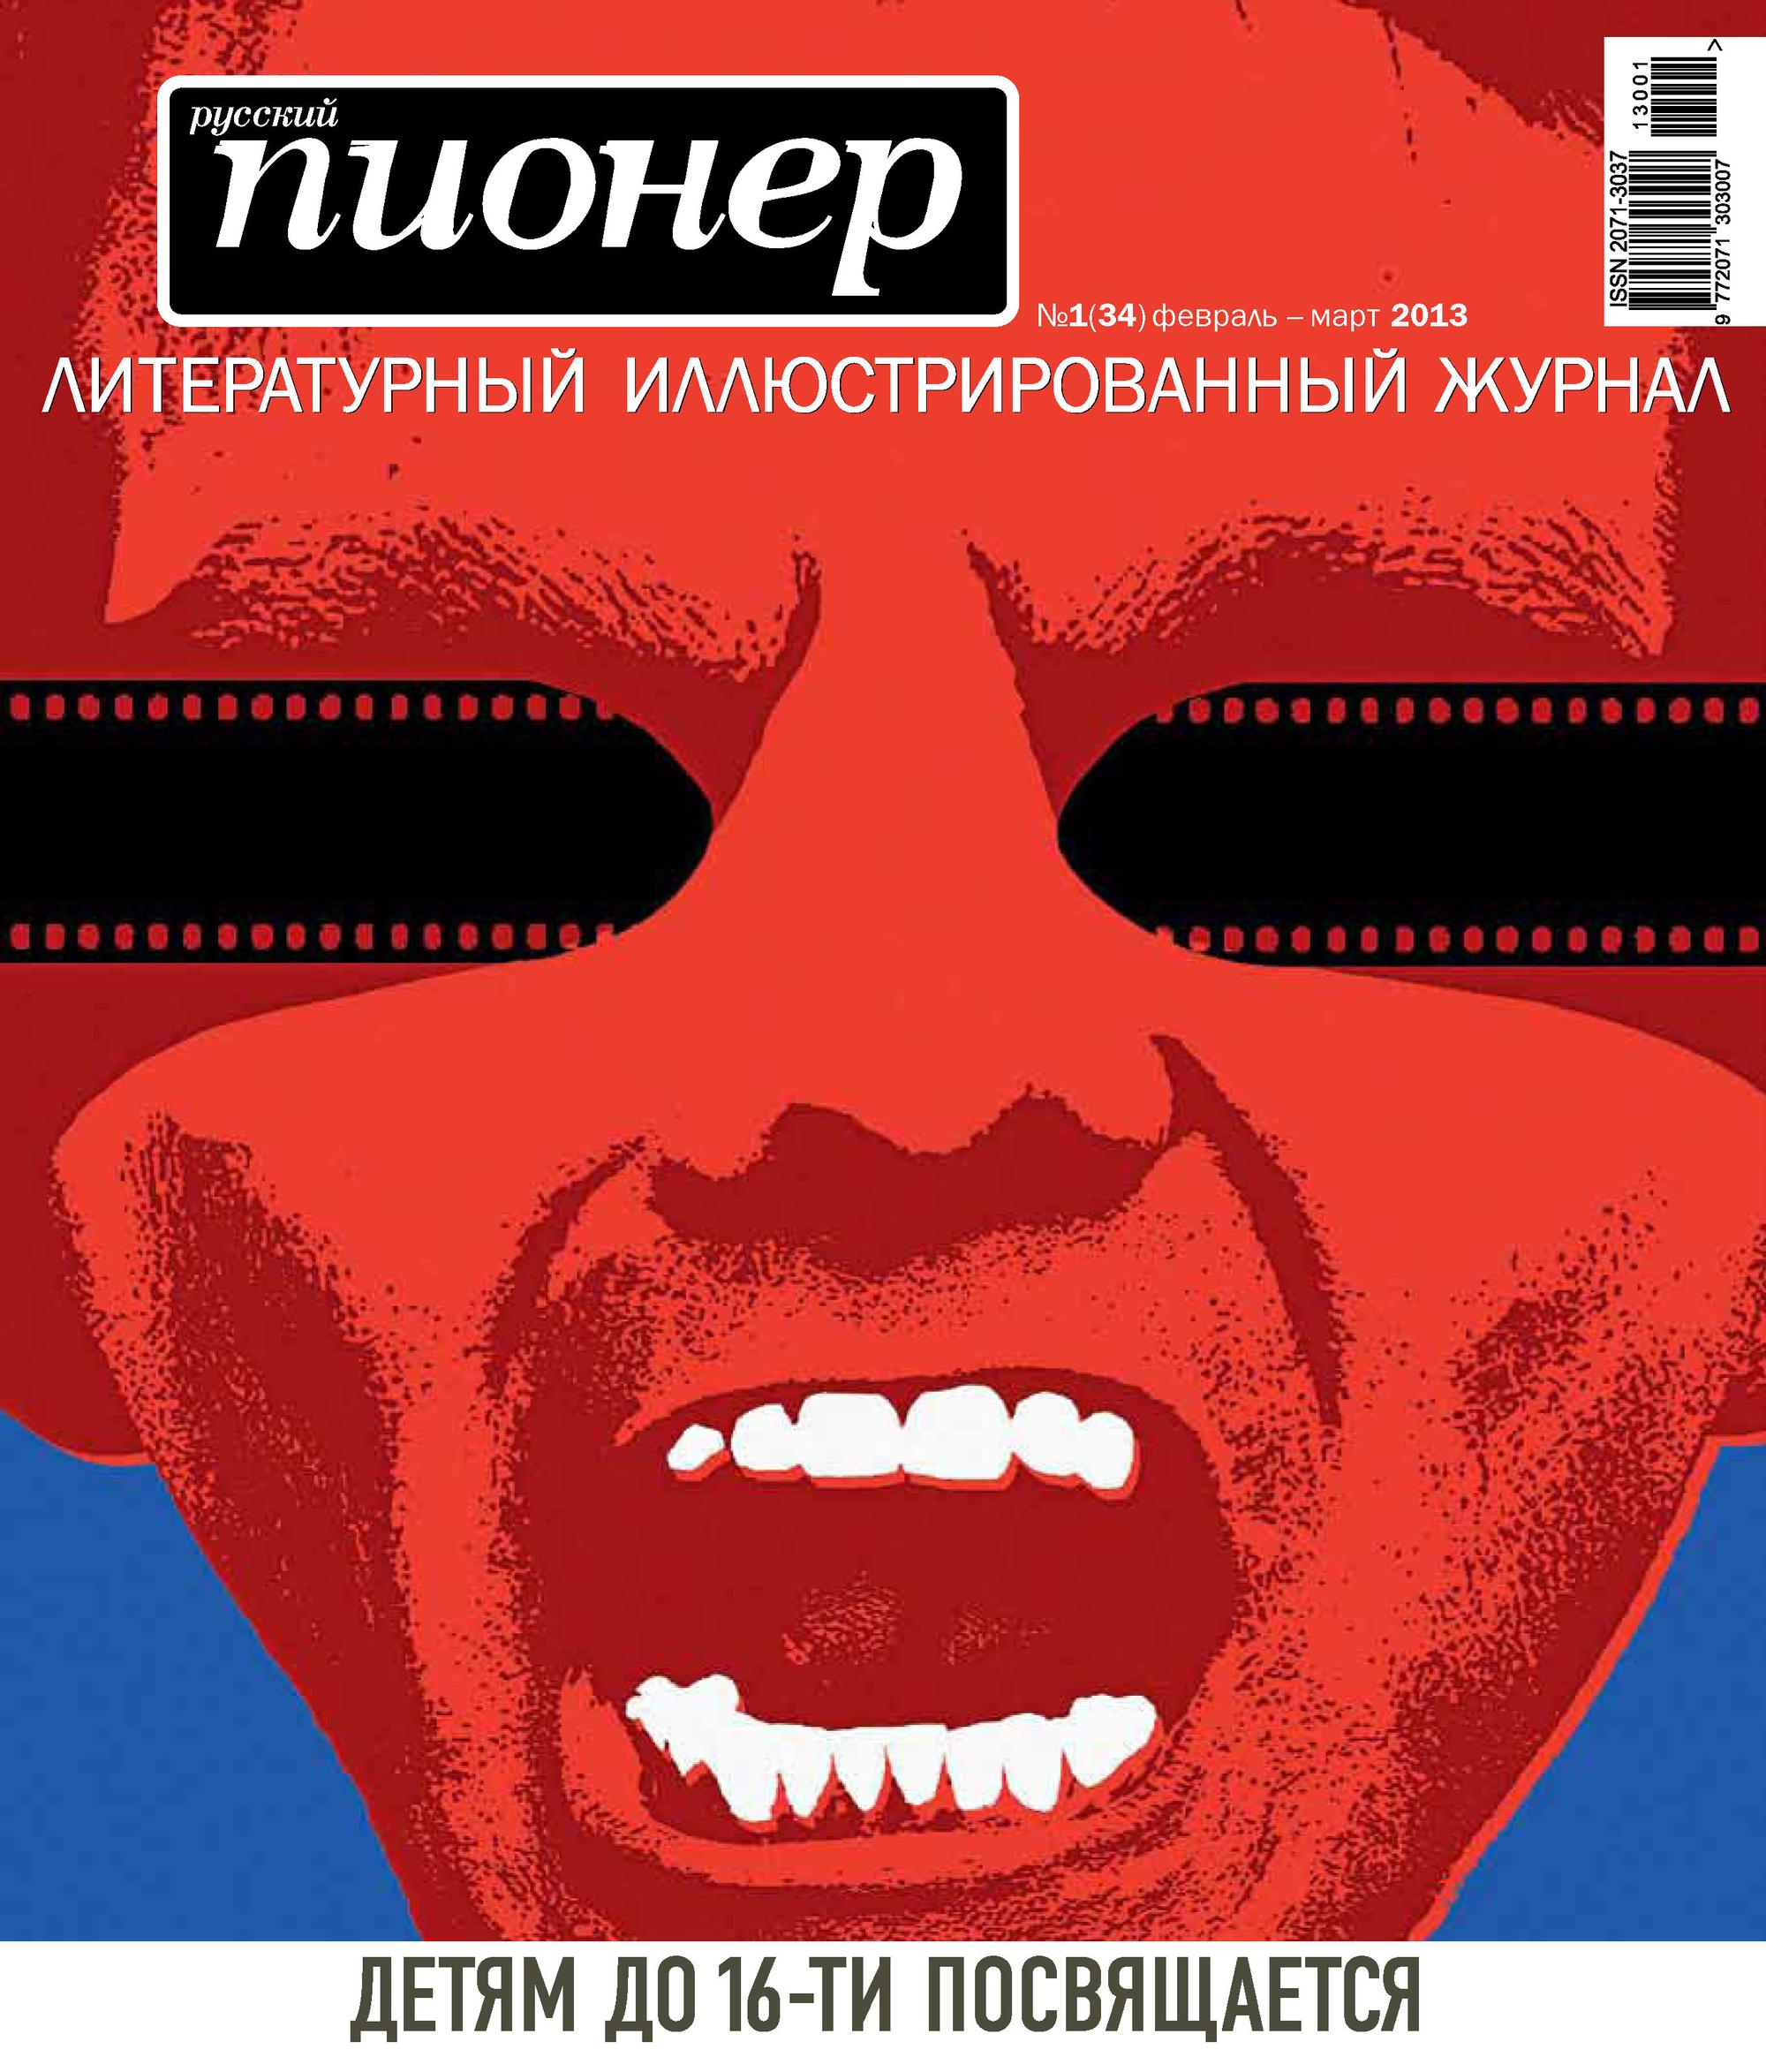 Русский пионер №1 (34), февраль-март 2013